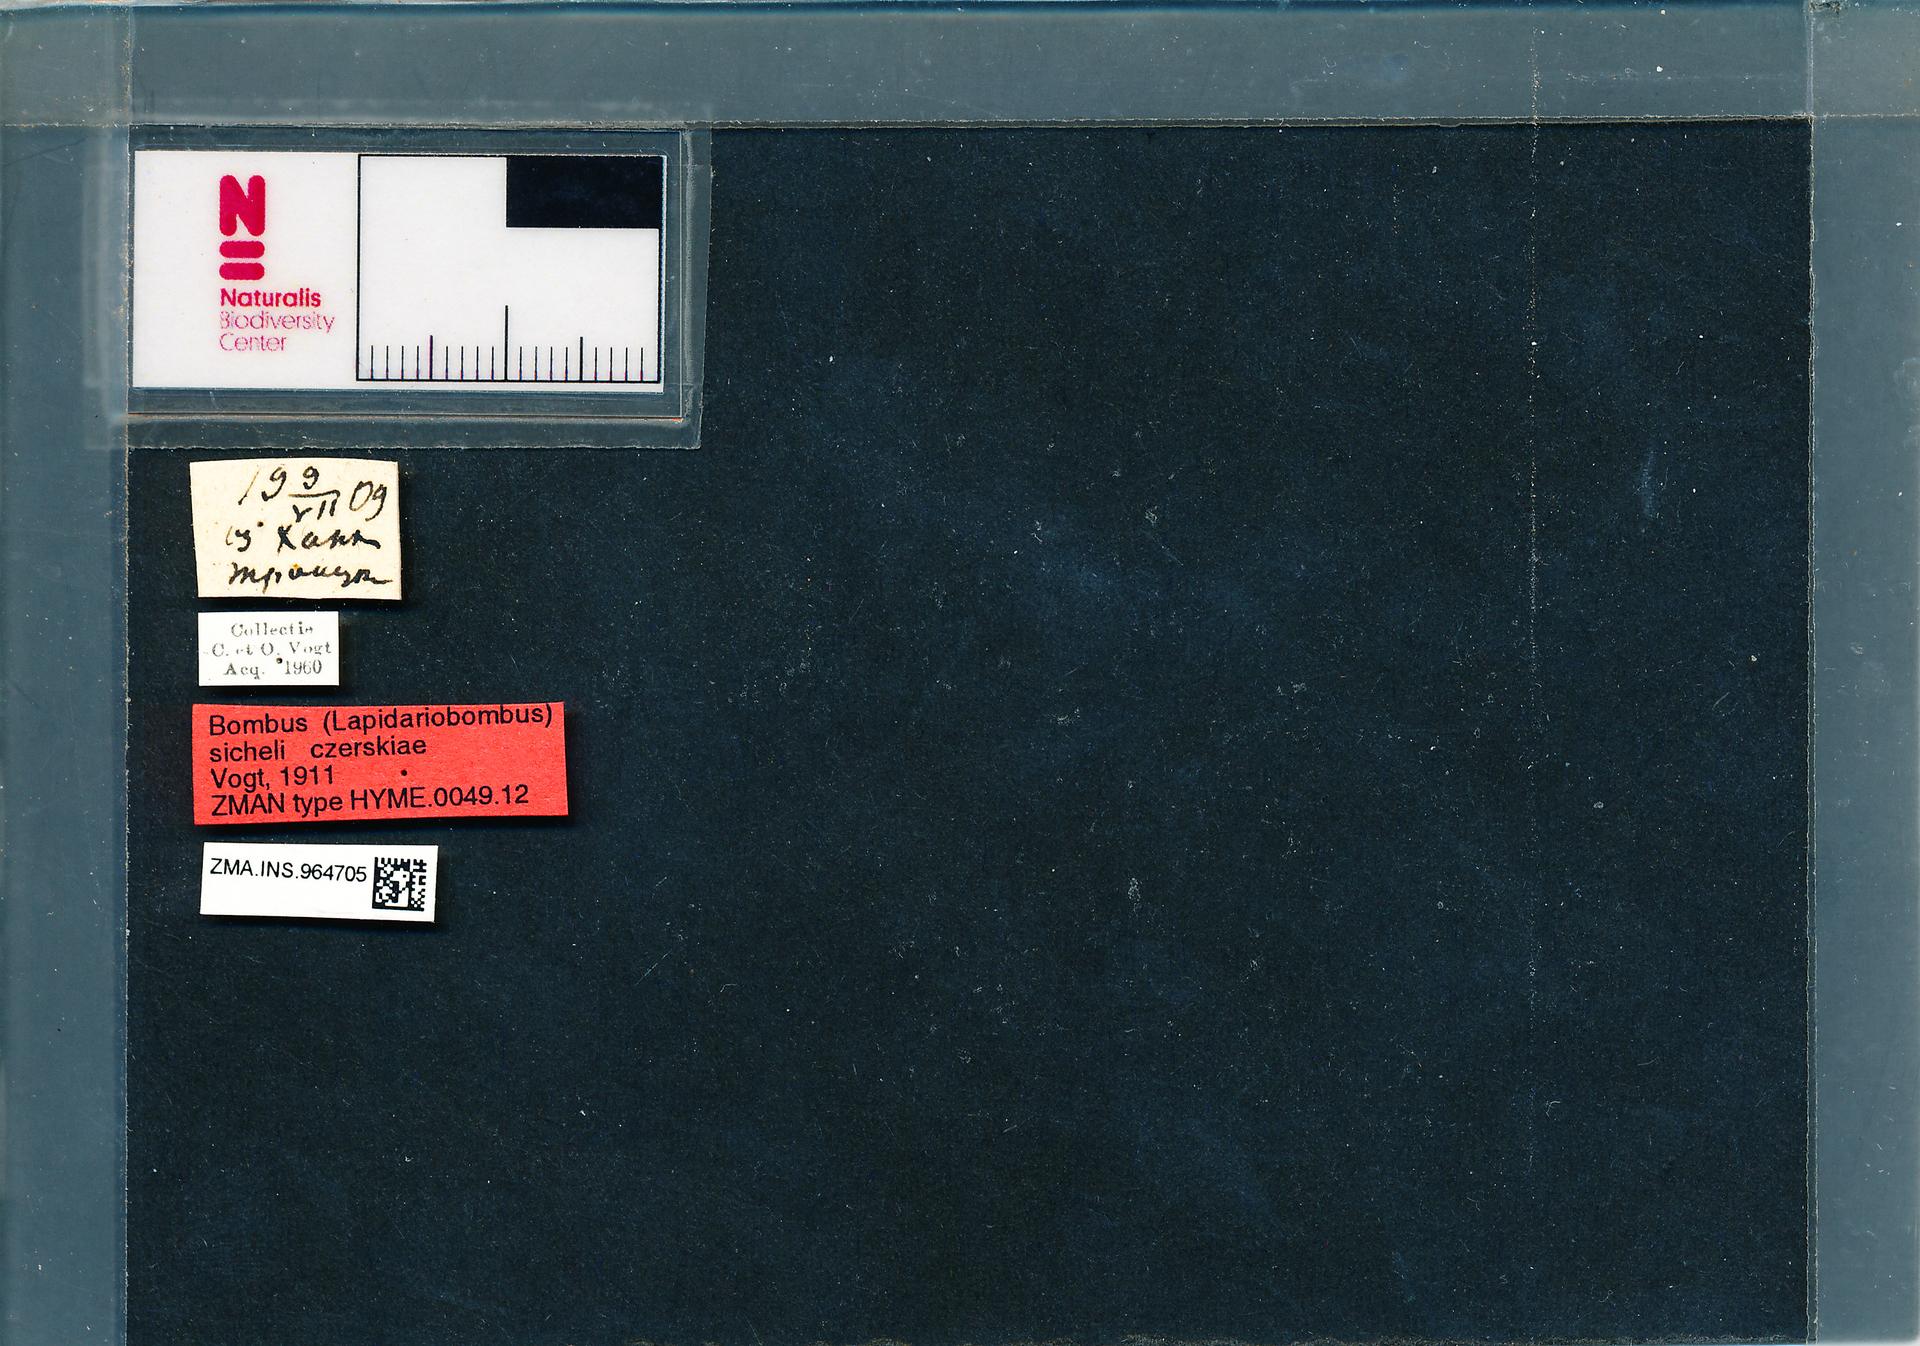 ZMA.INS.964705 | Bombus (Melanobombus) sichelii uniens Vogt, 1911